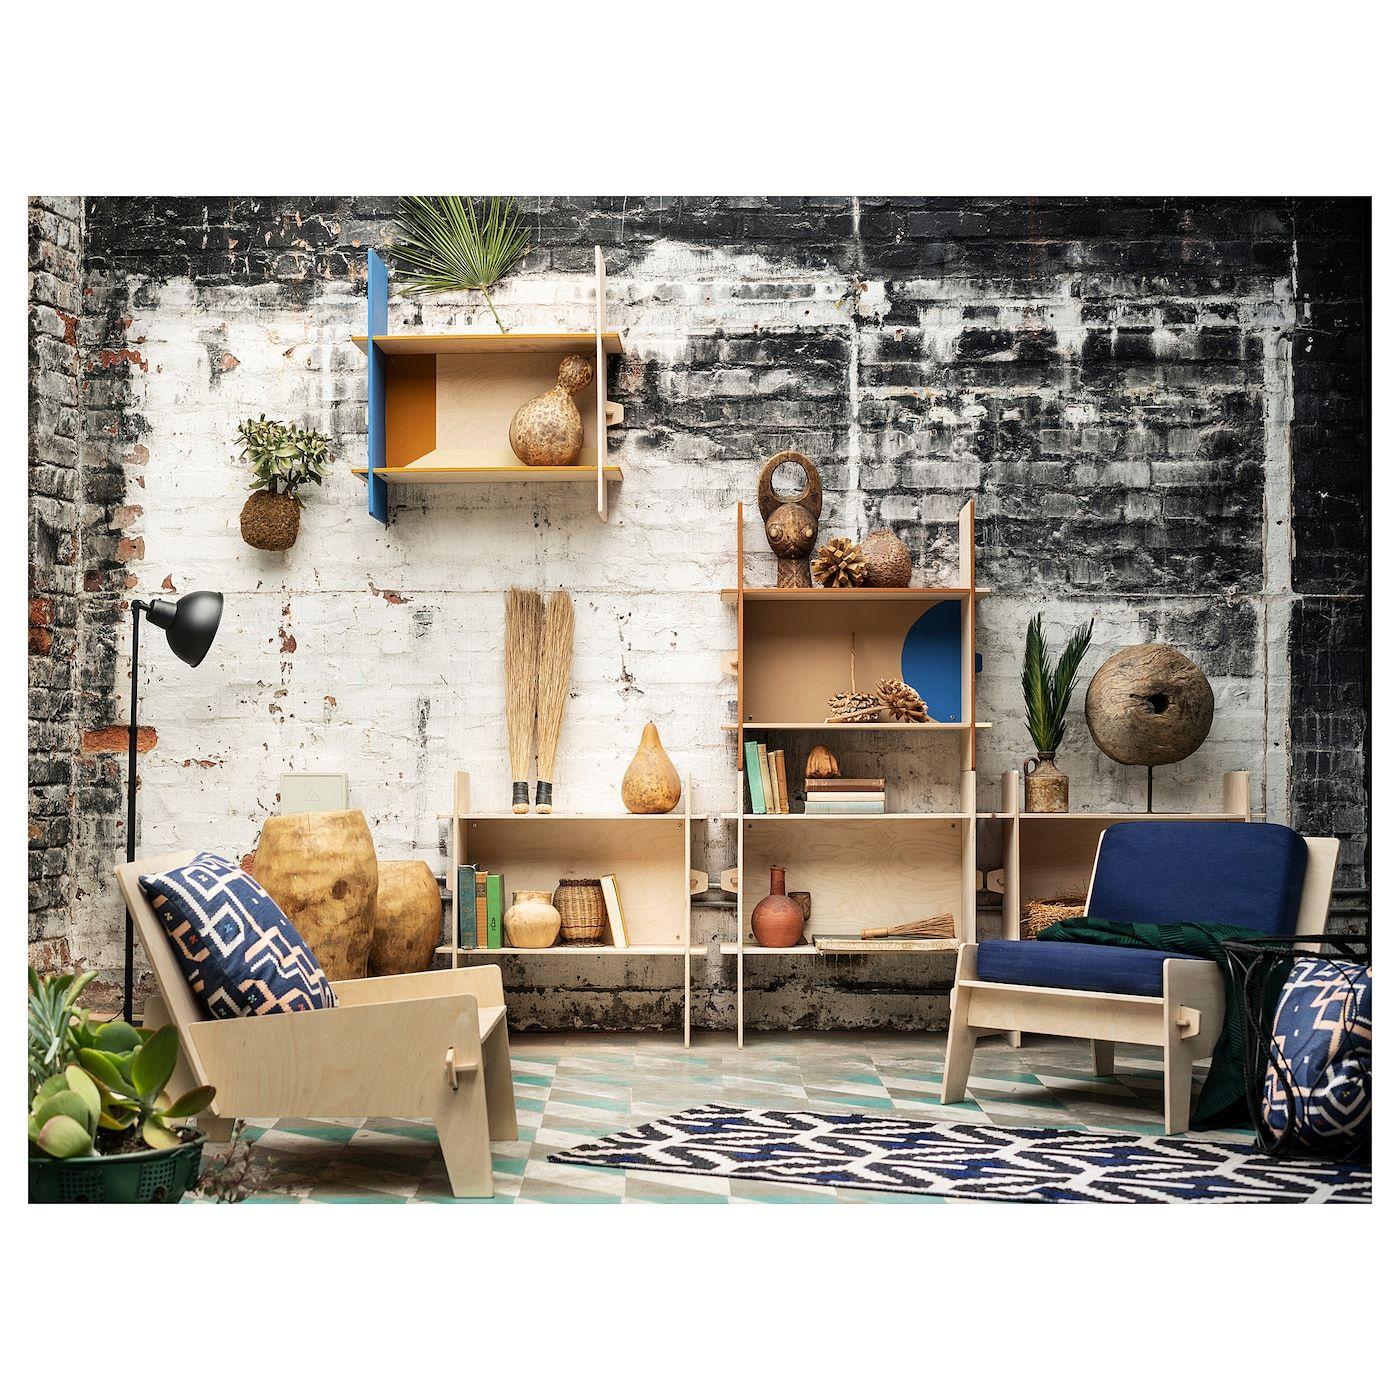 Ikea Us Furniture And Home Furnishings Ikea Design Furniture Collection Furniture